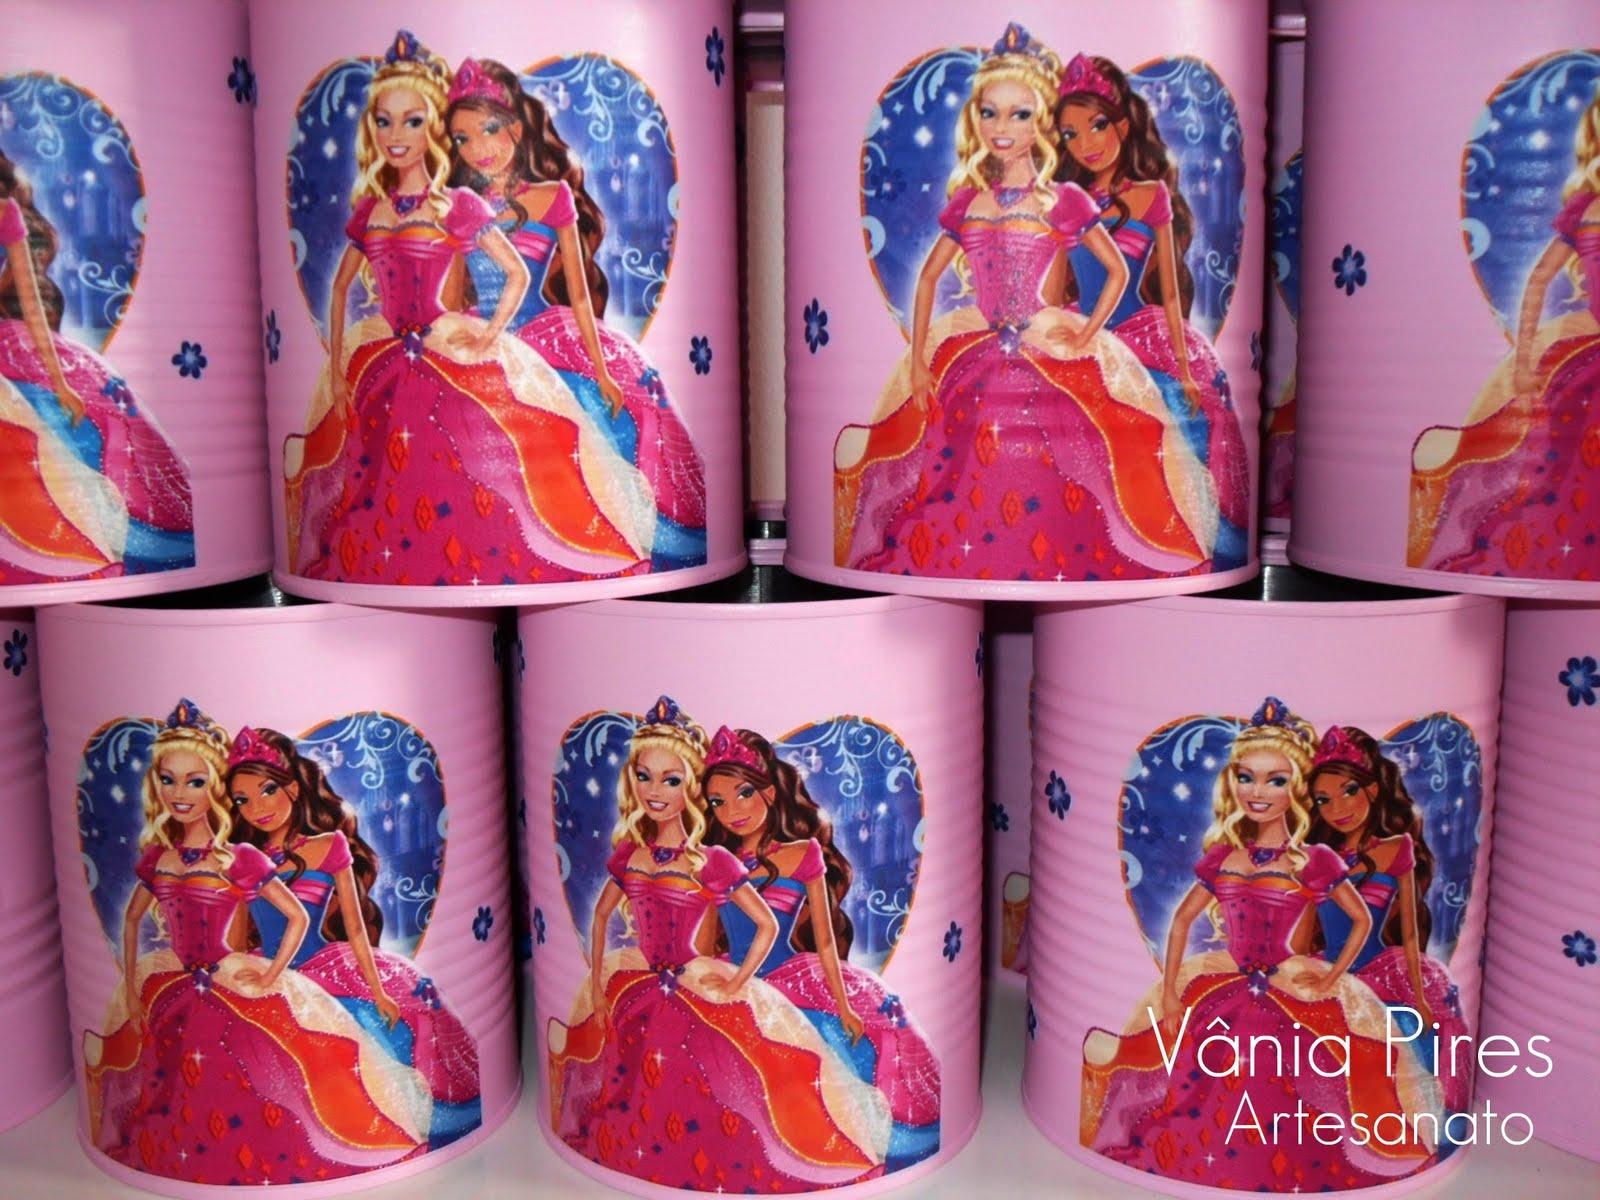 Castelo Diamante Barbie Genuardis Portal Pic #14